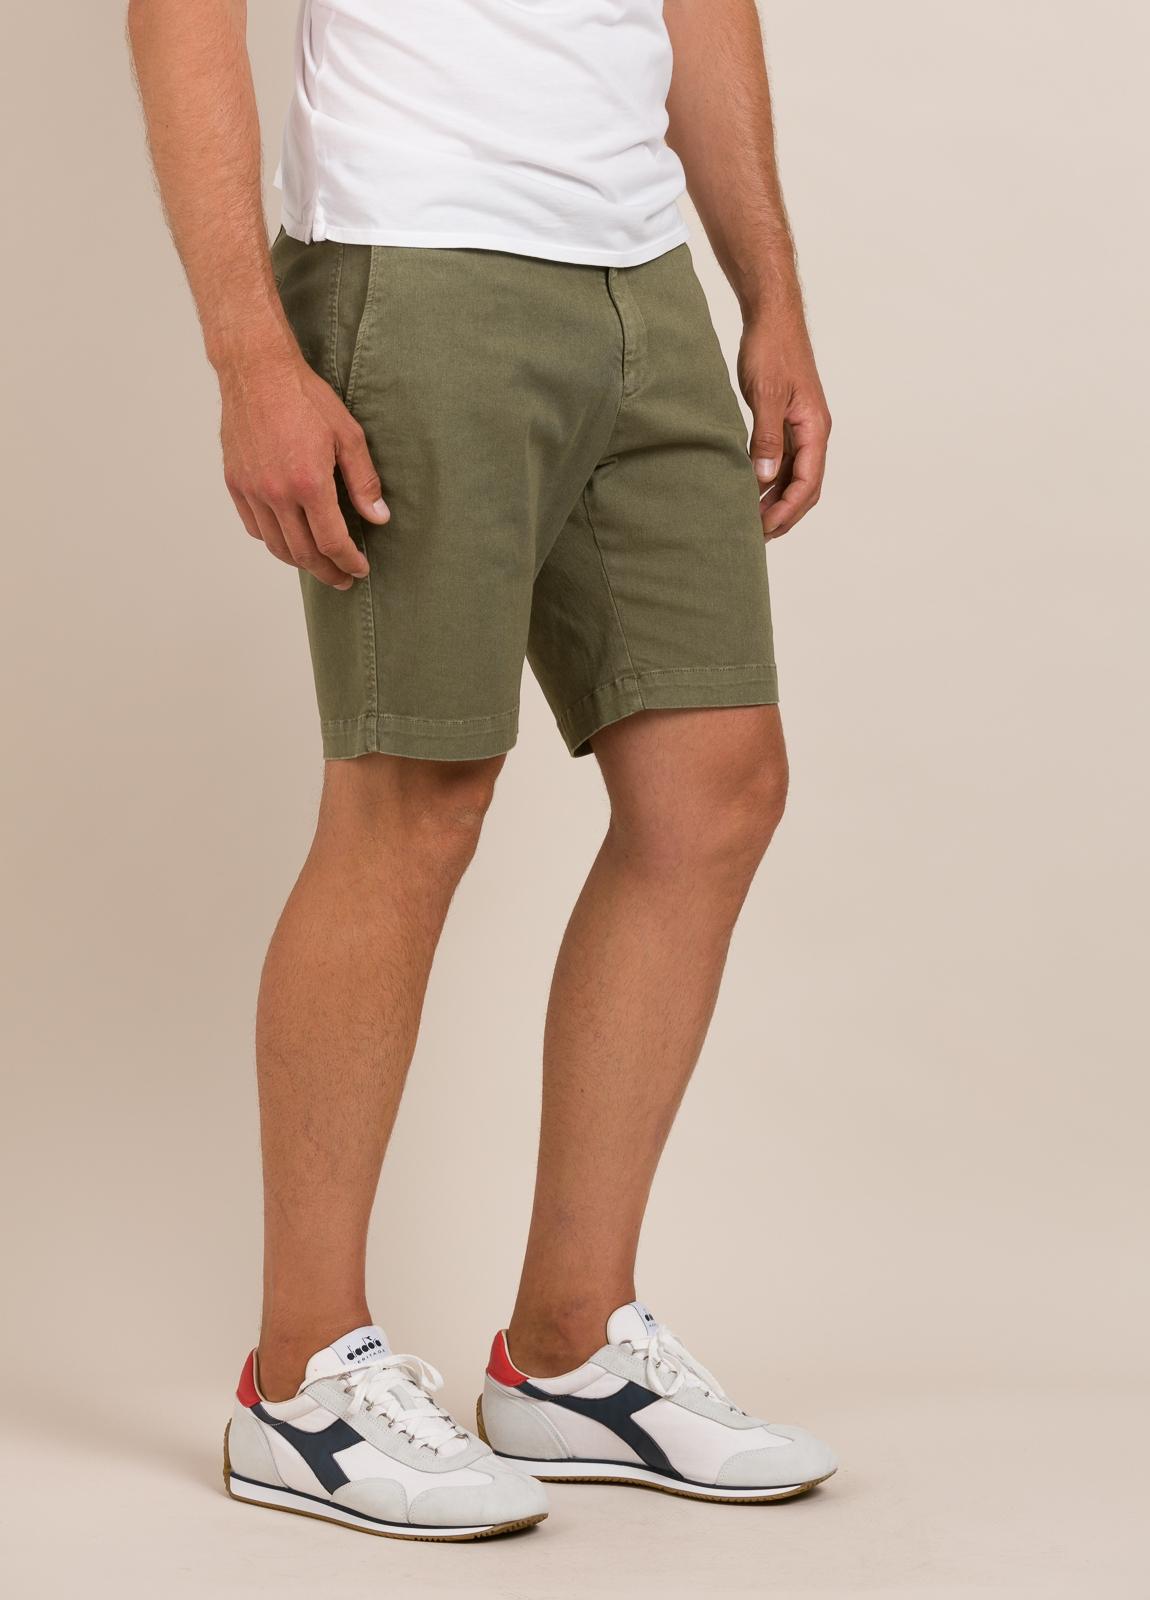 Bermuda modelo THOMAS color kaki, 100% Algodón. - Ítem4